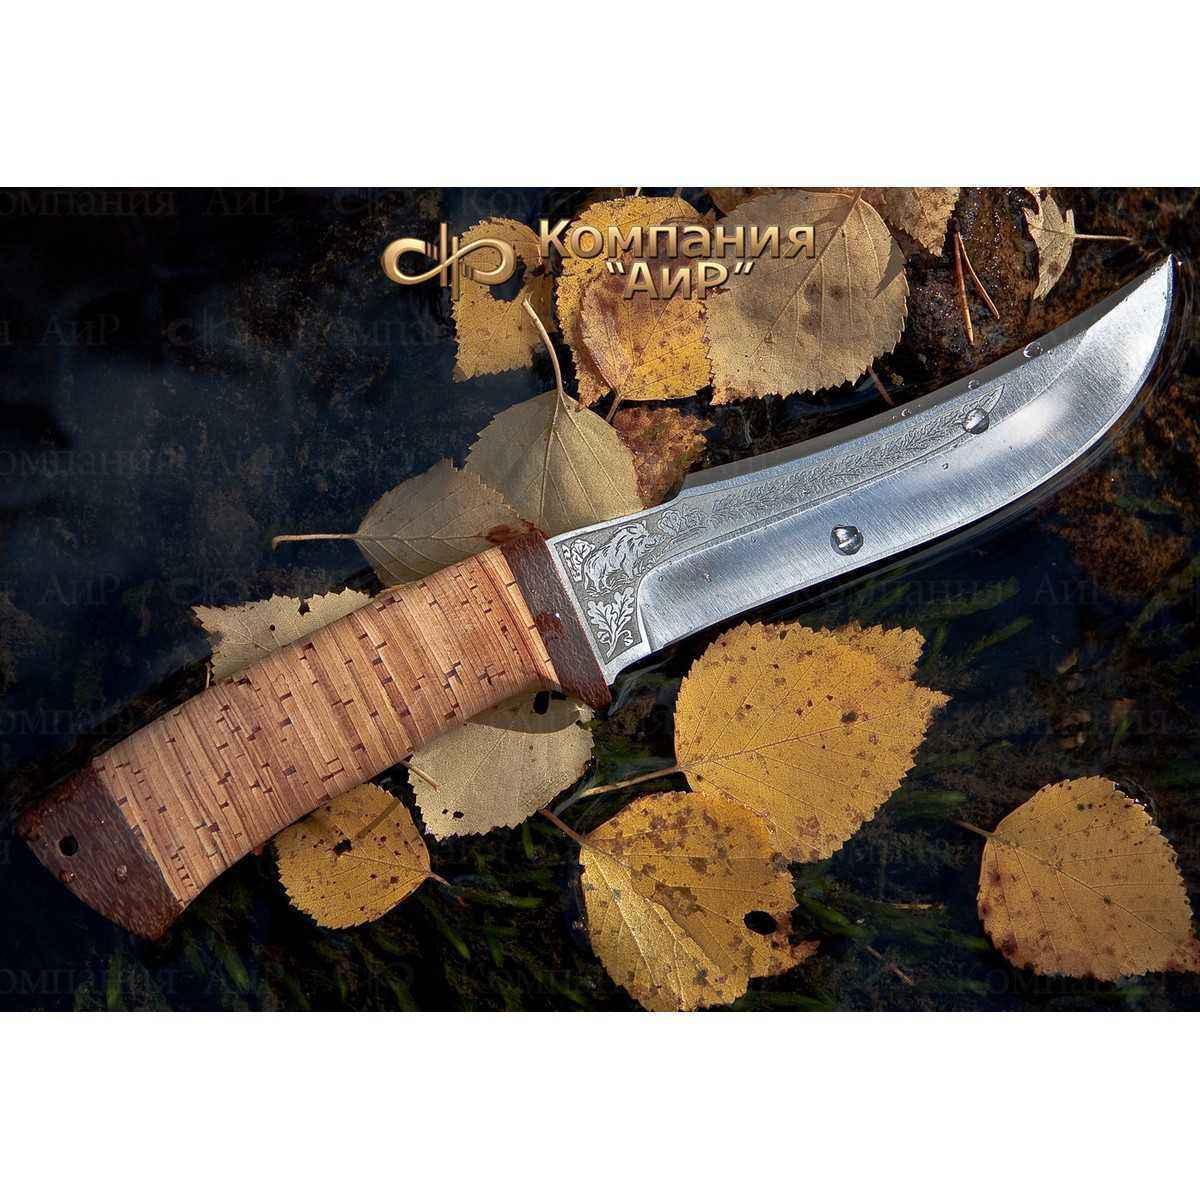 Нож АиР Клык, сталь 95х18, рукоять береста, алюминий